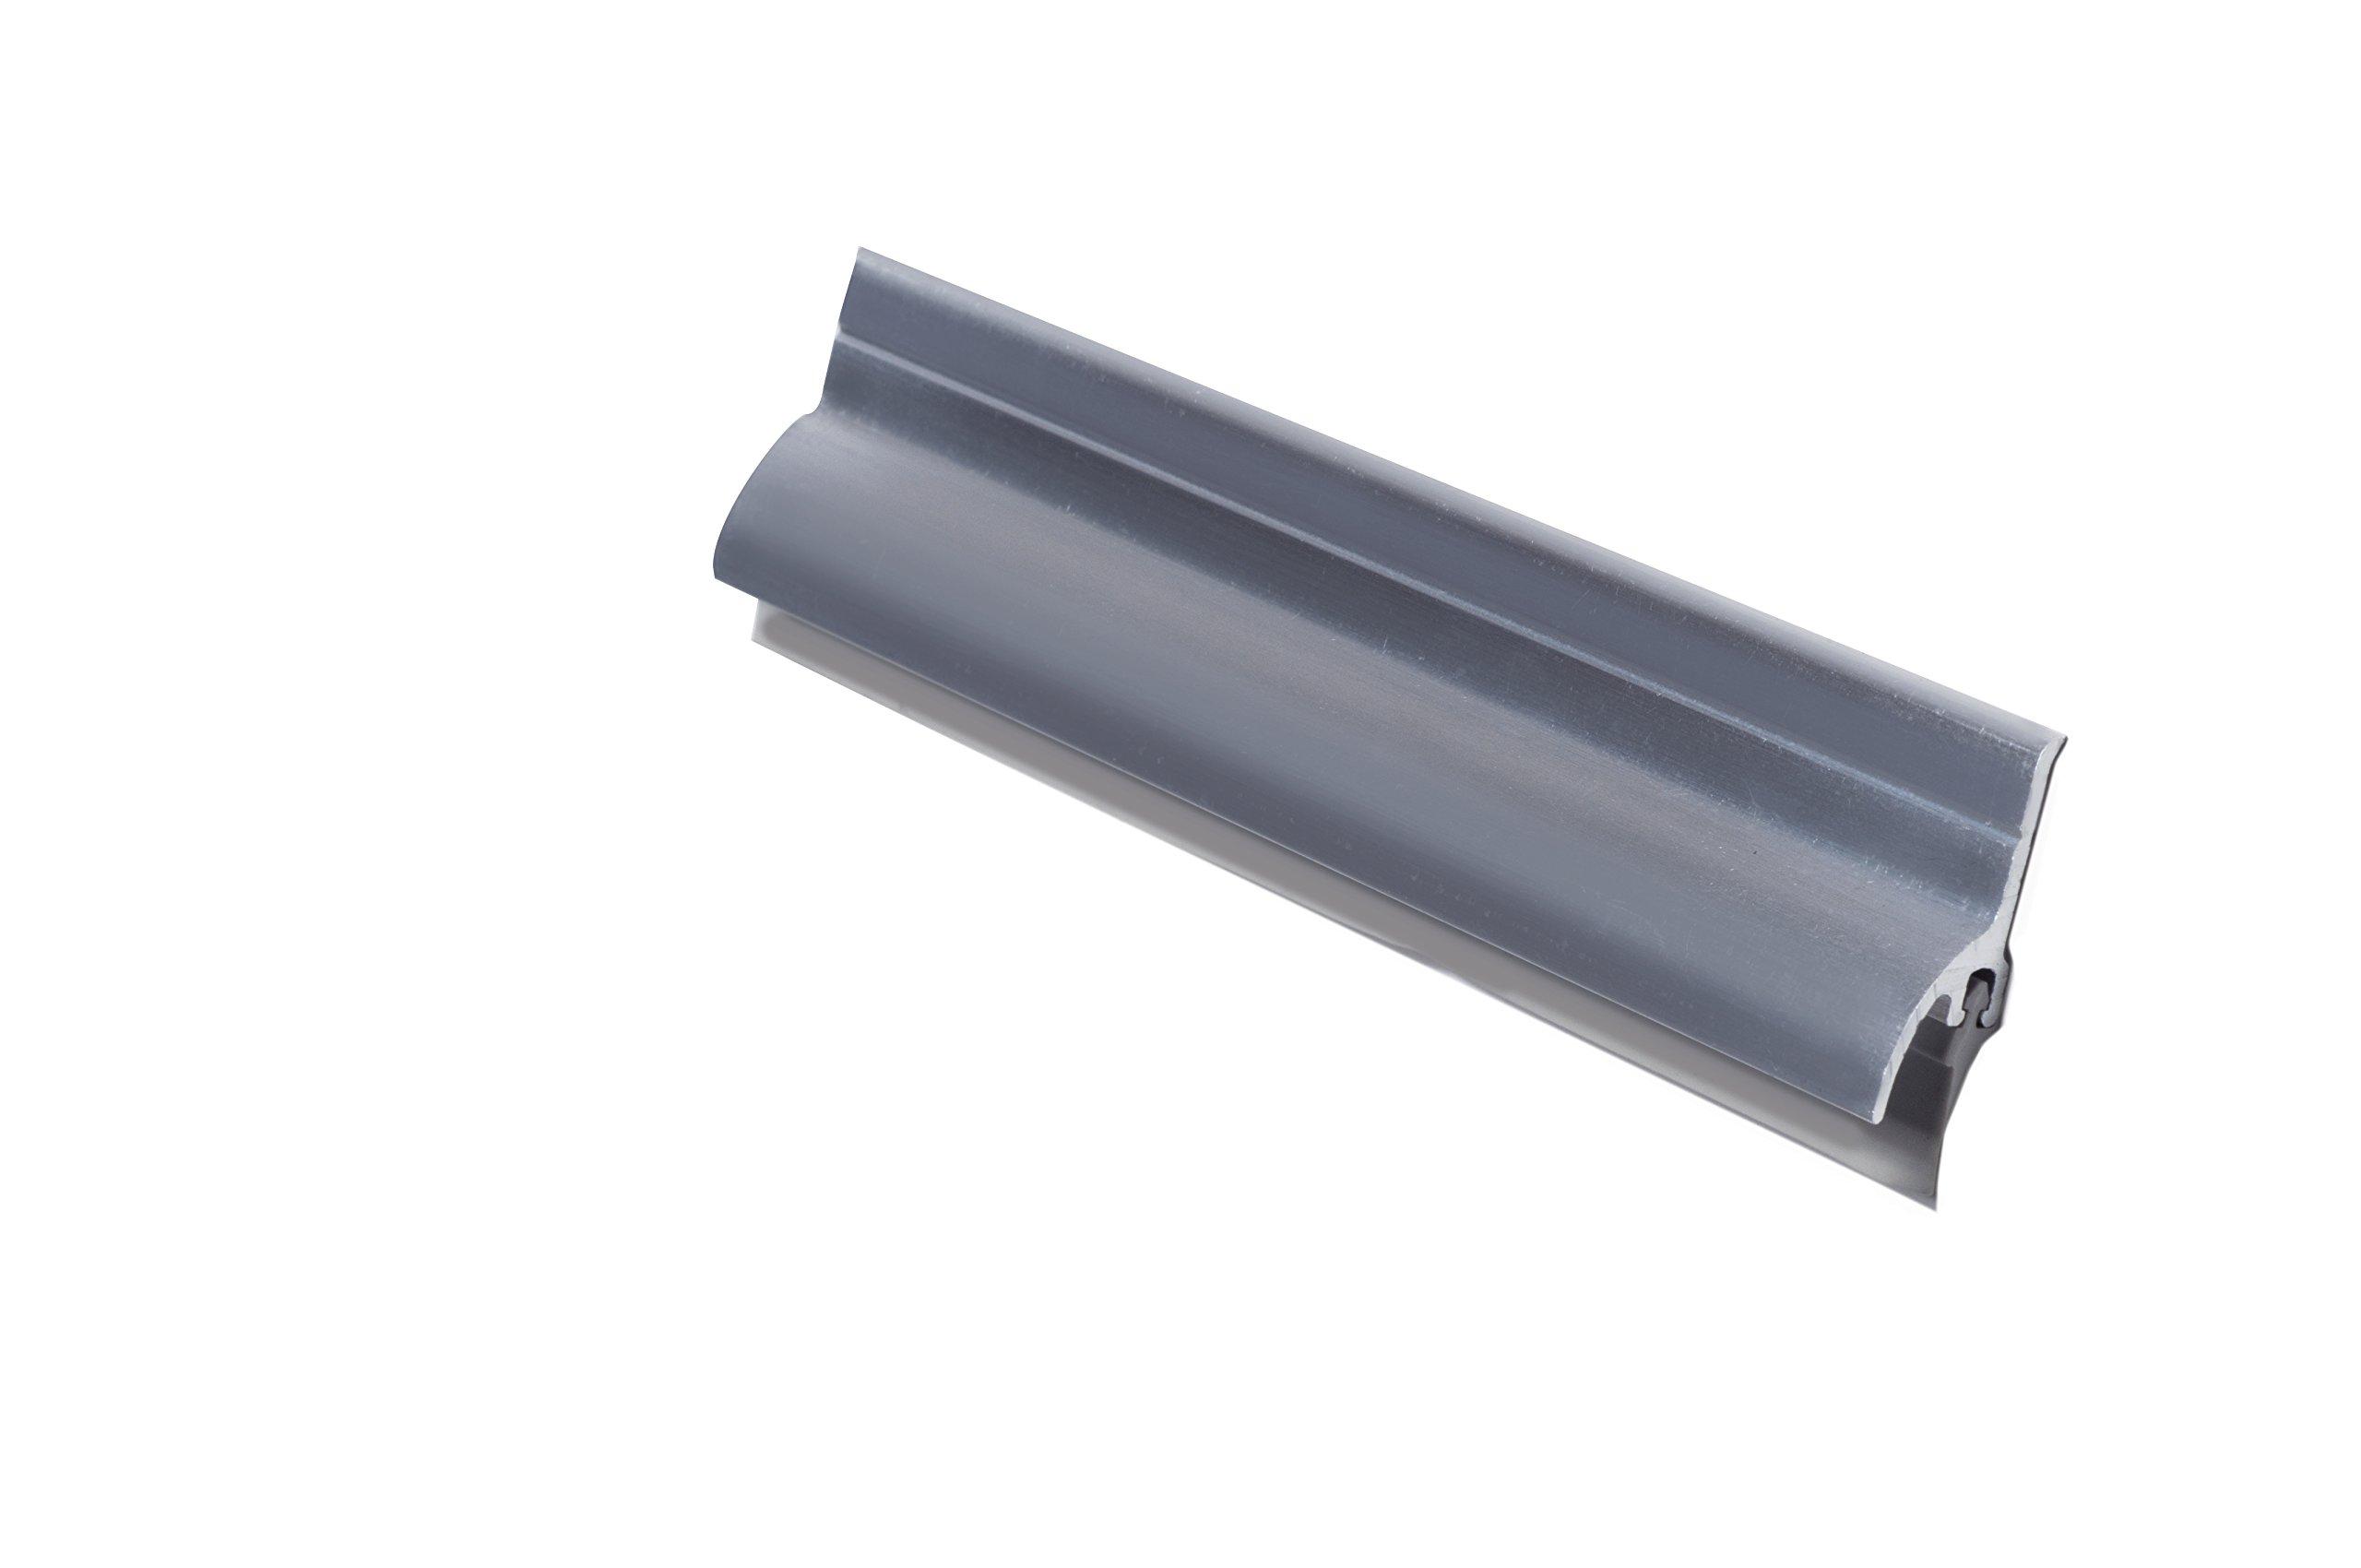 Pemko 085647 3452AV36 Door Bottom Sweep, Mill Finish Aluminum, 1.5'' Width, 36'' Length, Aluminum by Pemko